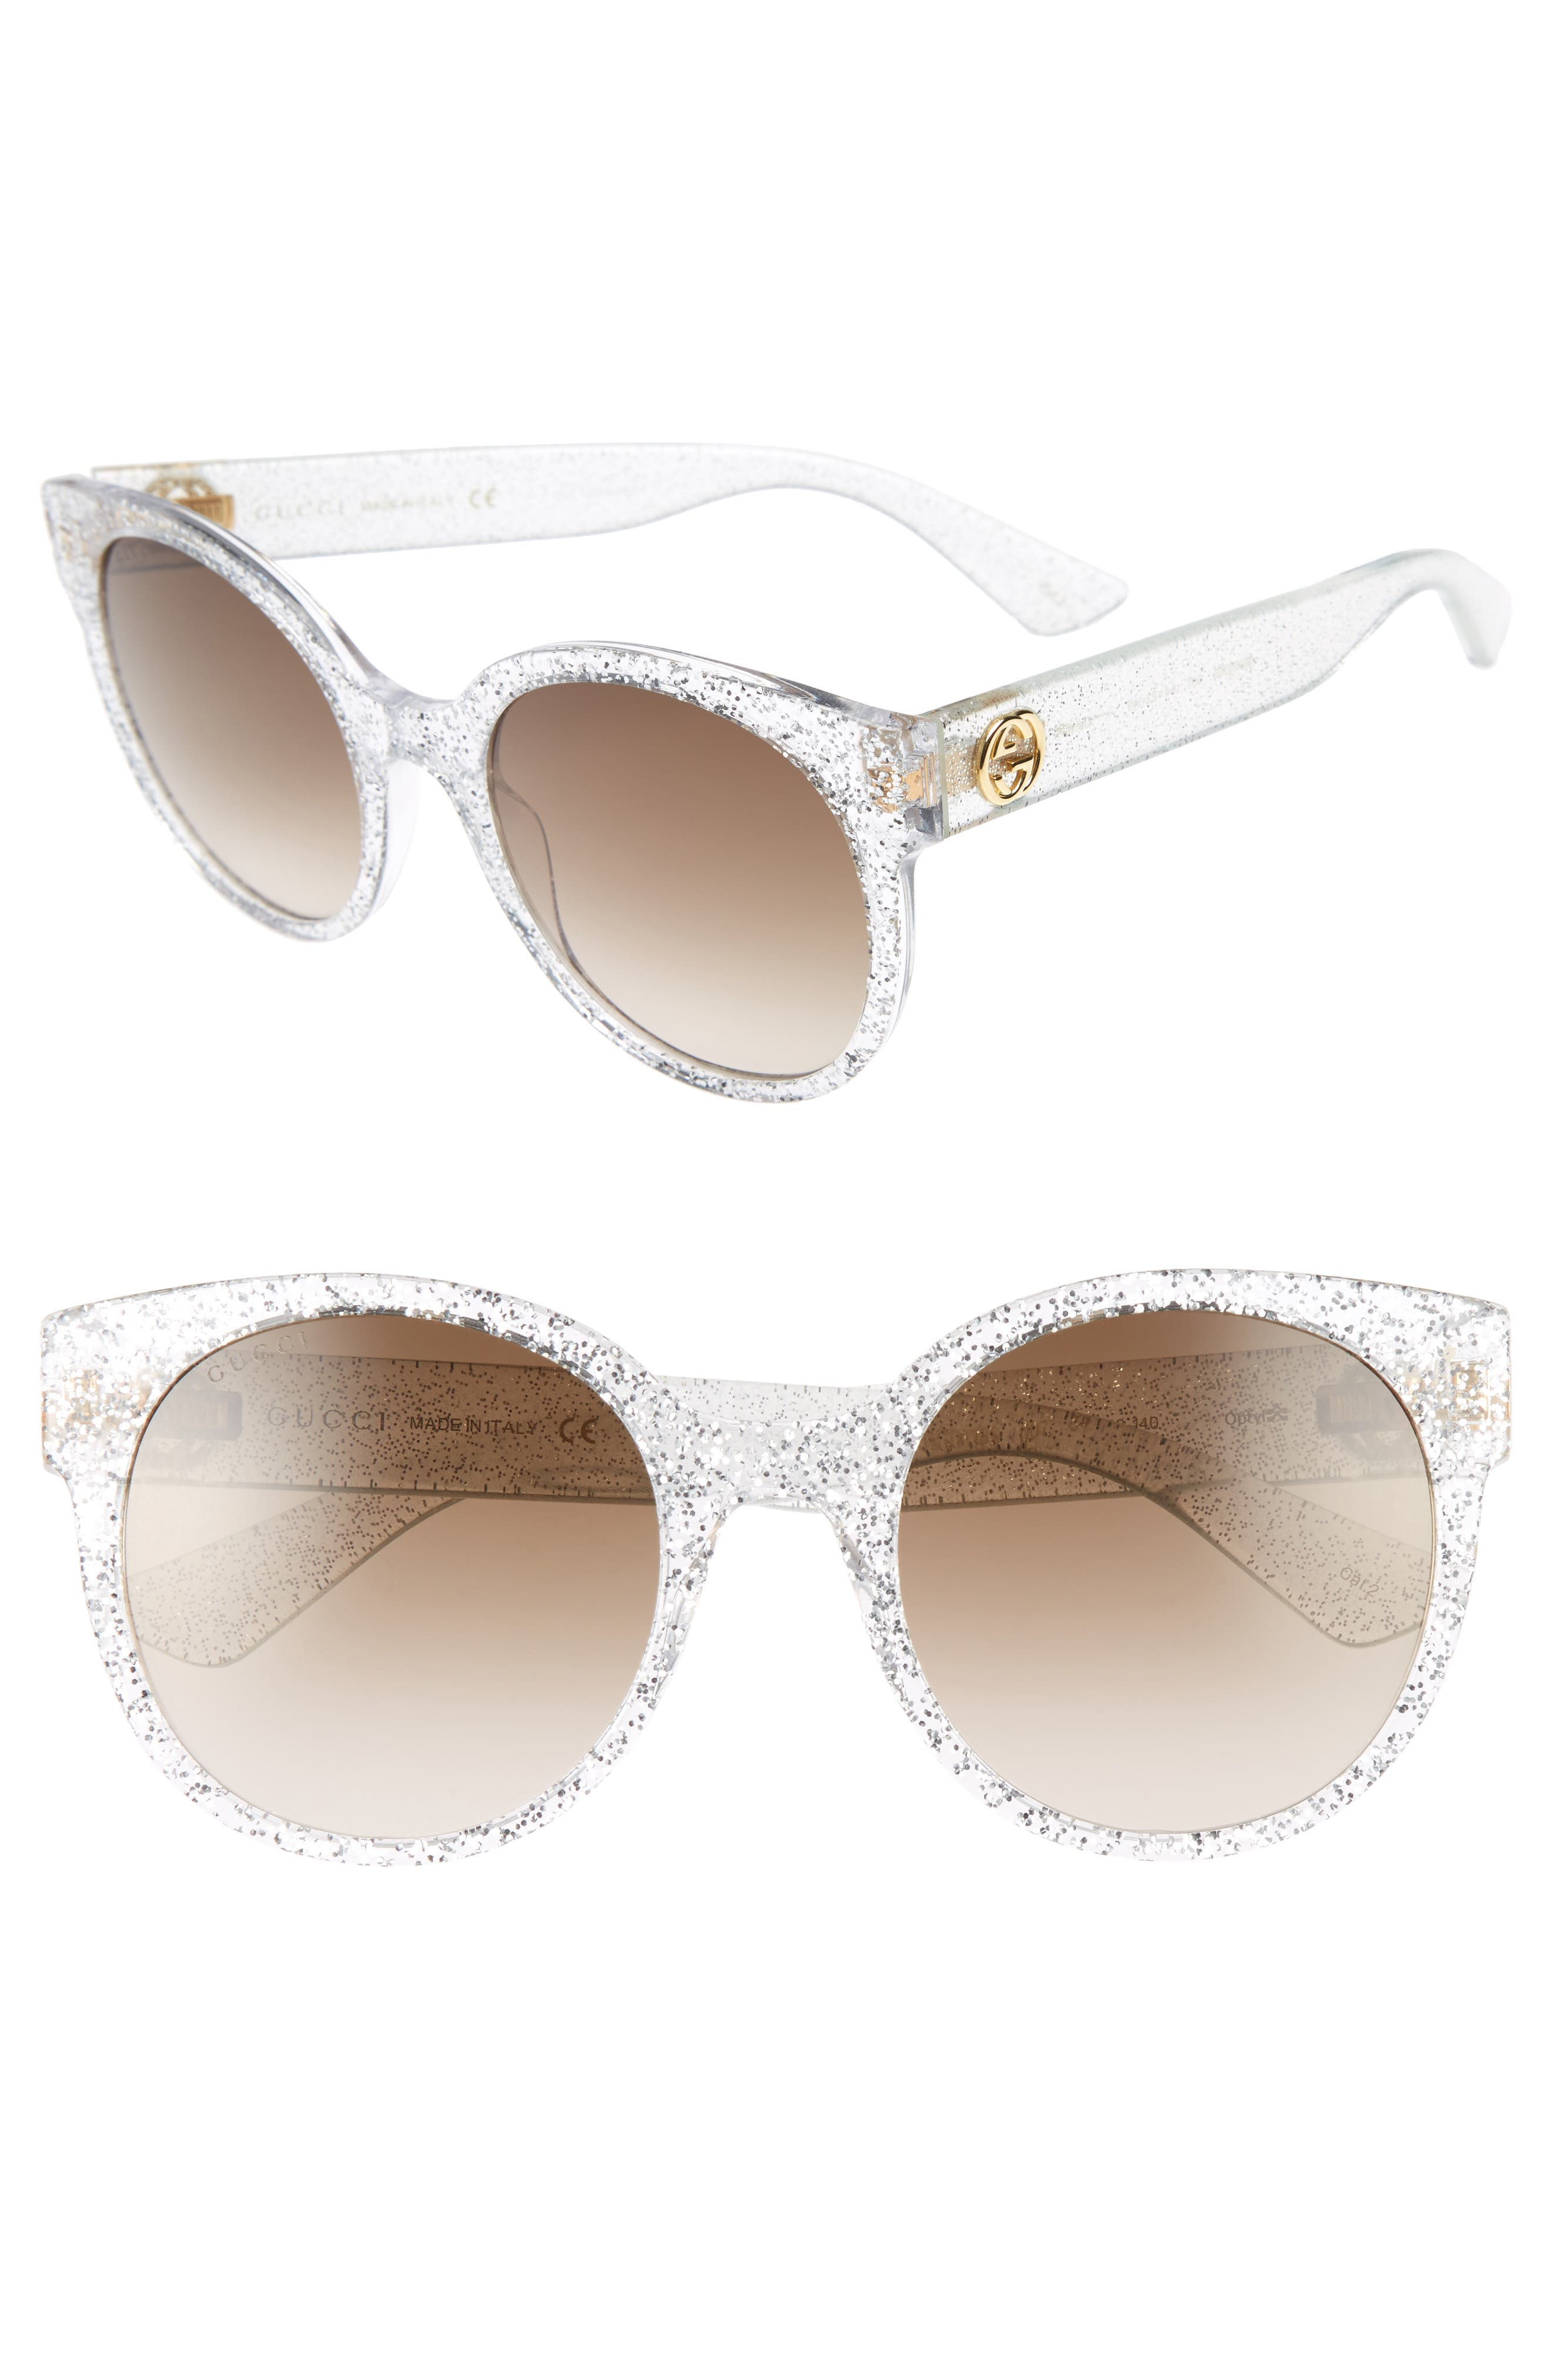 54mm Glitter Sunglasses,                             Main thumbnail 1, color,                             040